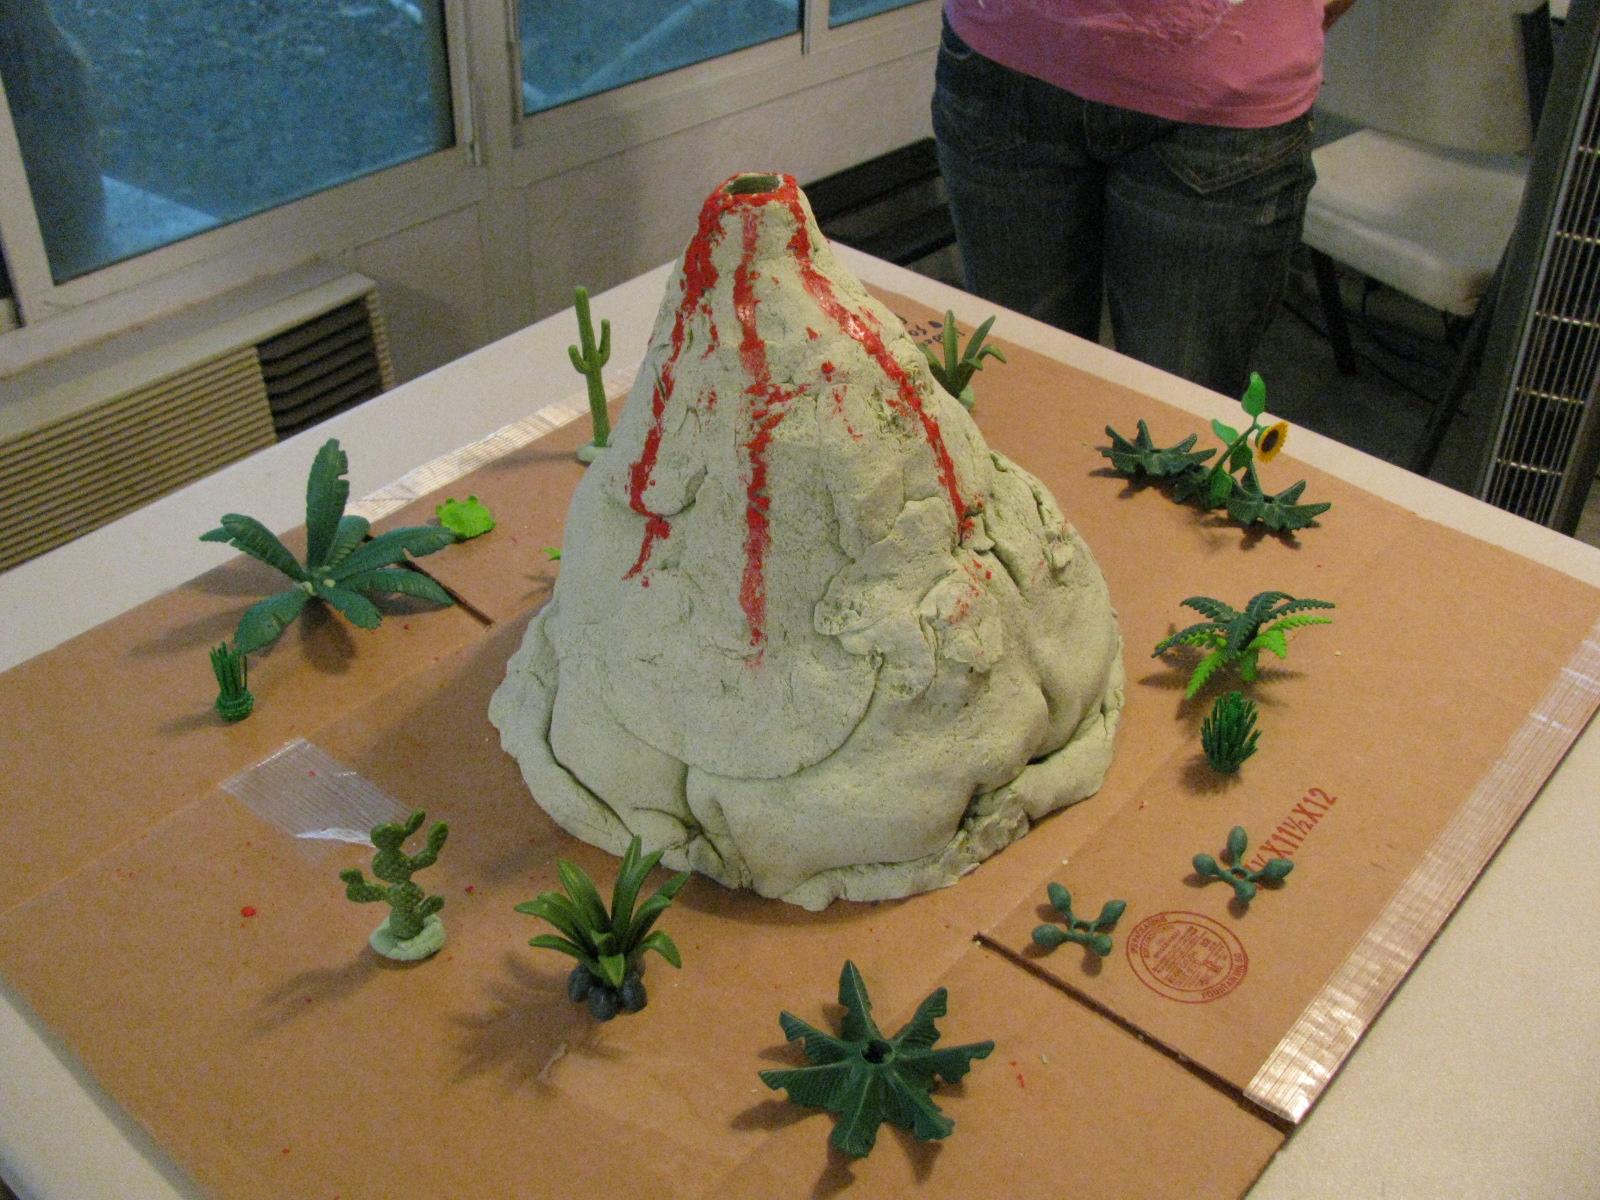 Cheryl S Bunch Model Volcano 6th Grade Science Project